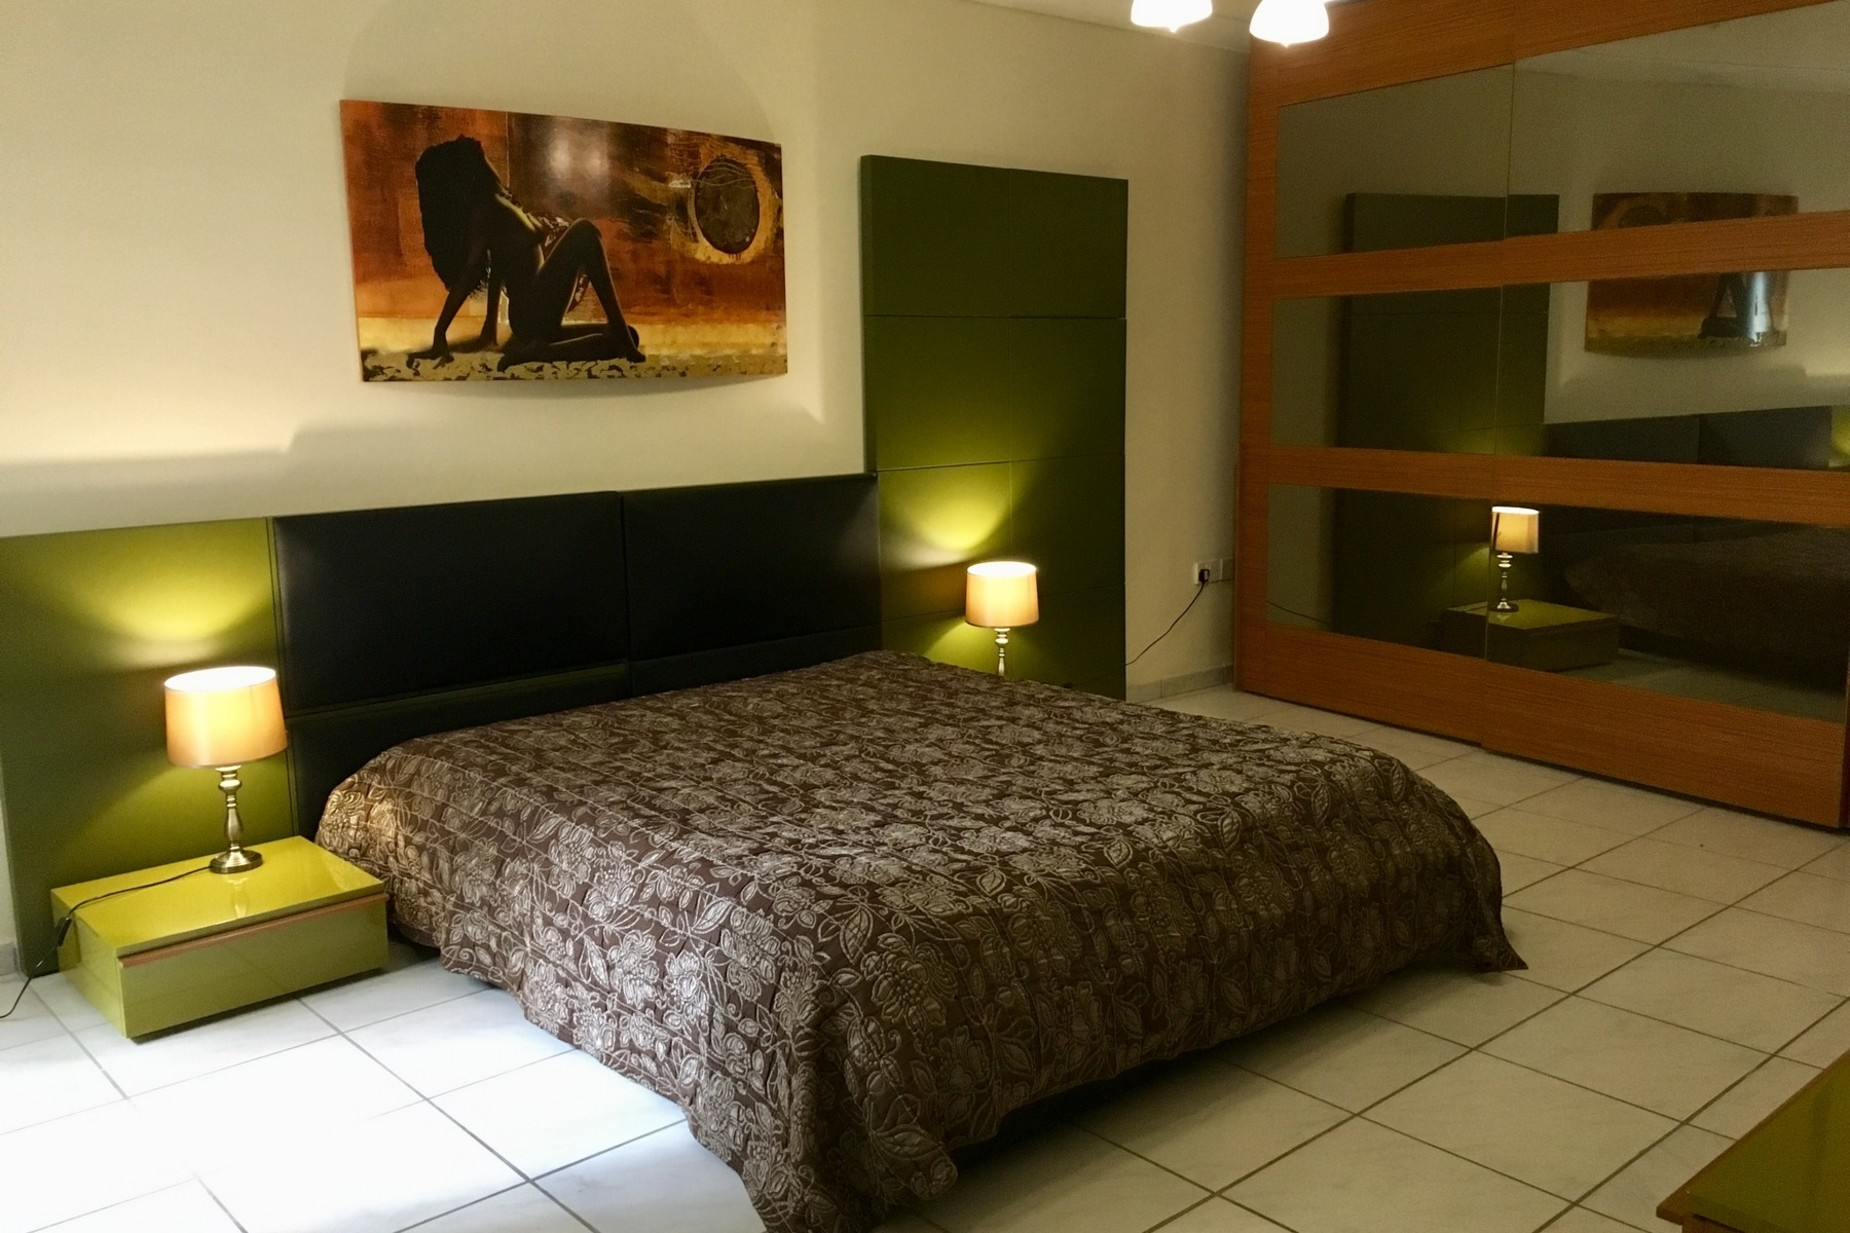 3 bed Apartment For Sale in Vittoriosa, Vittoriosa - thumb 4